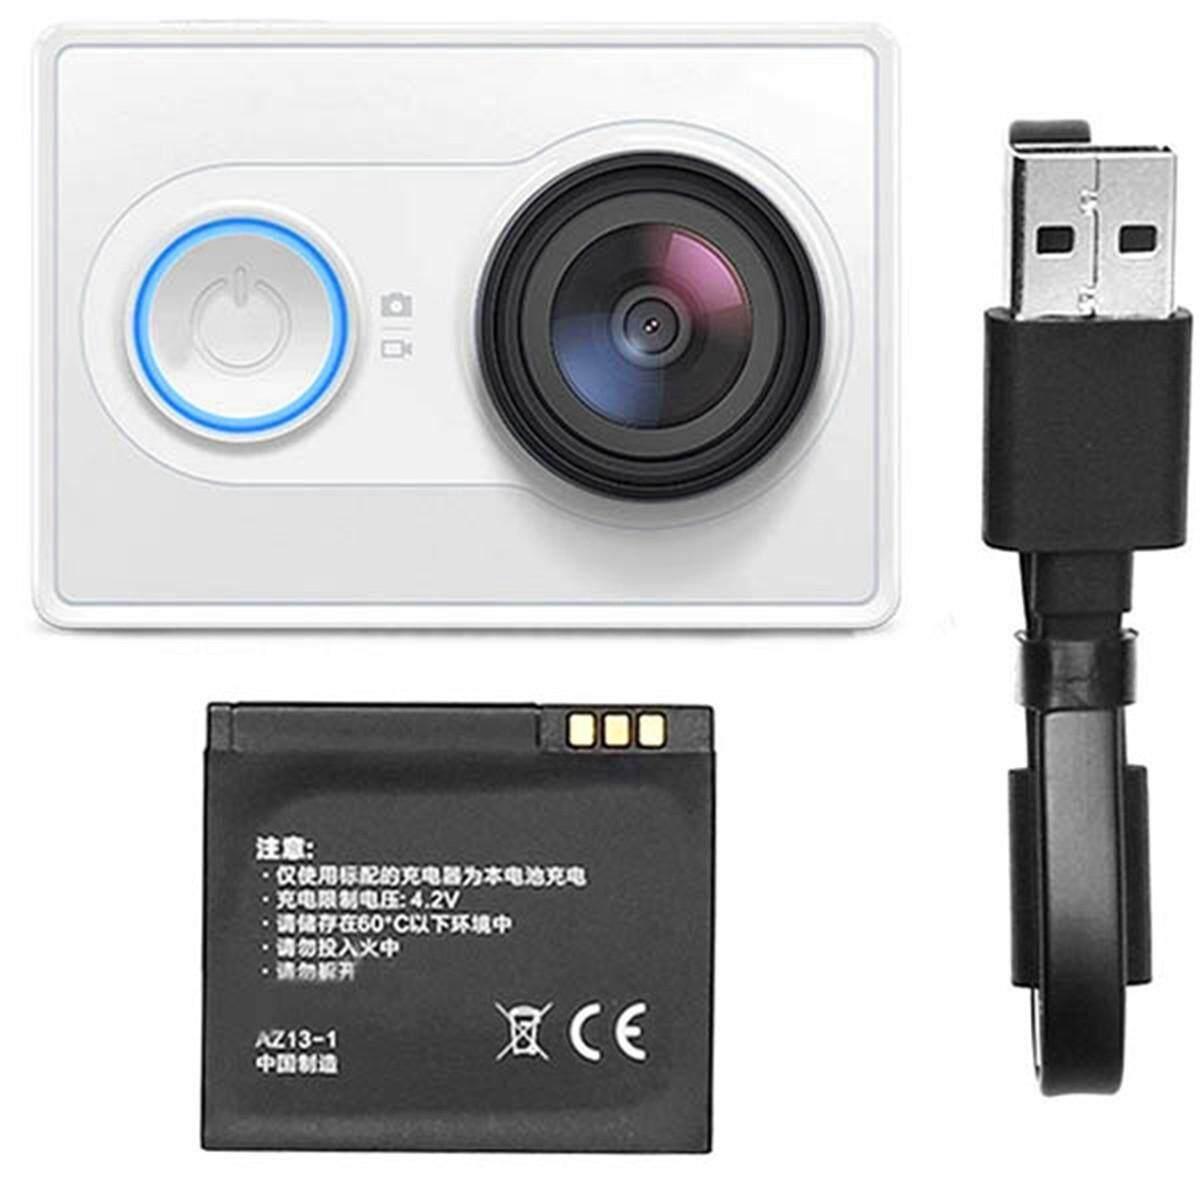 Asli A7LS BSI CMOS Wifi Olahraga Kamera Aksi-Intl